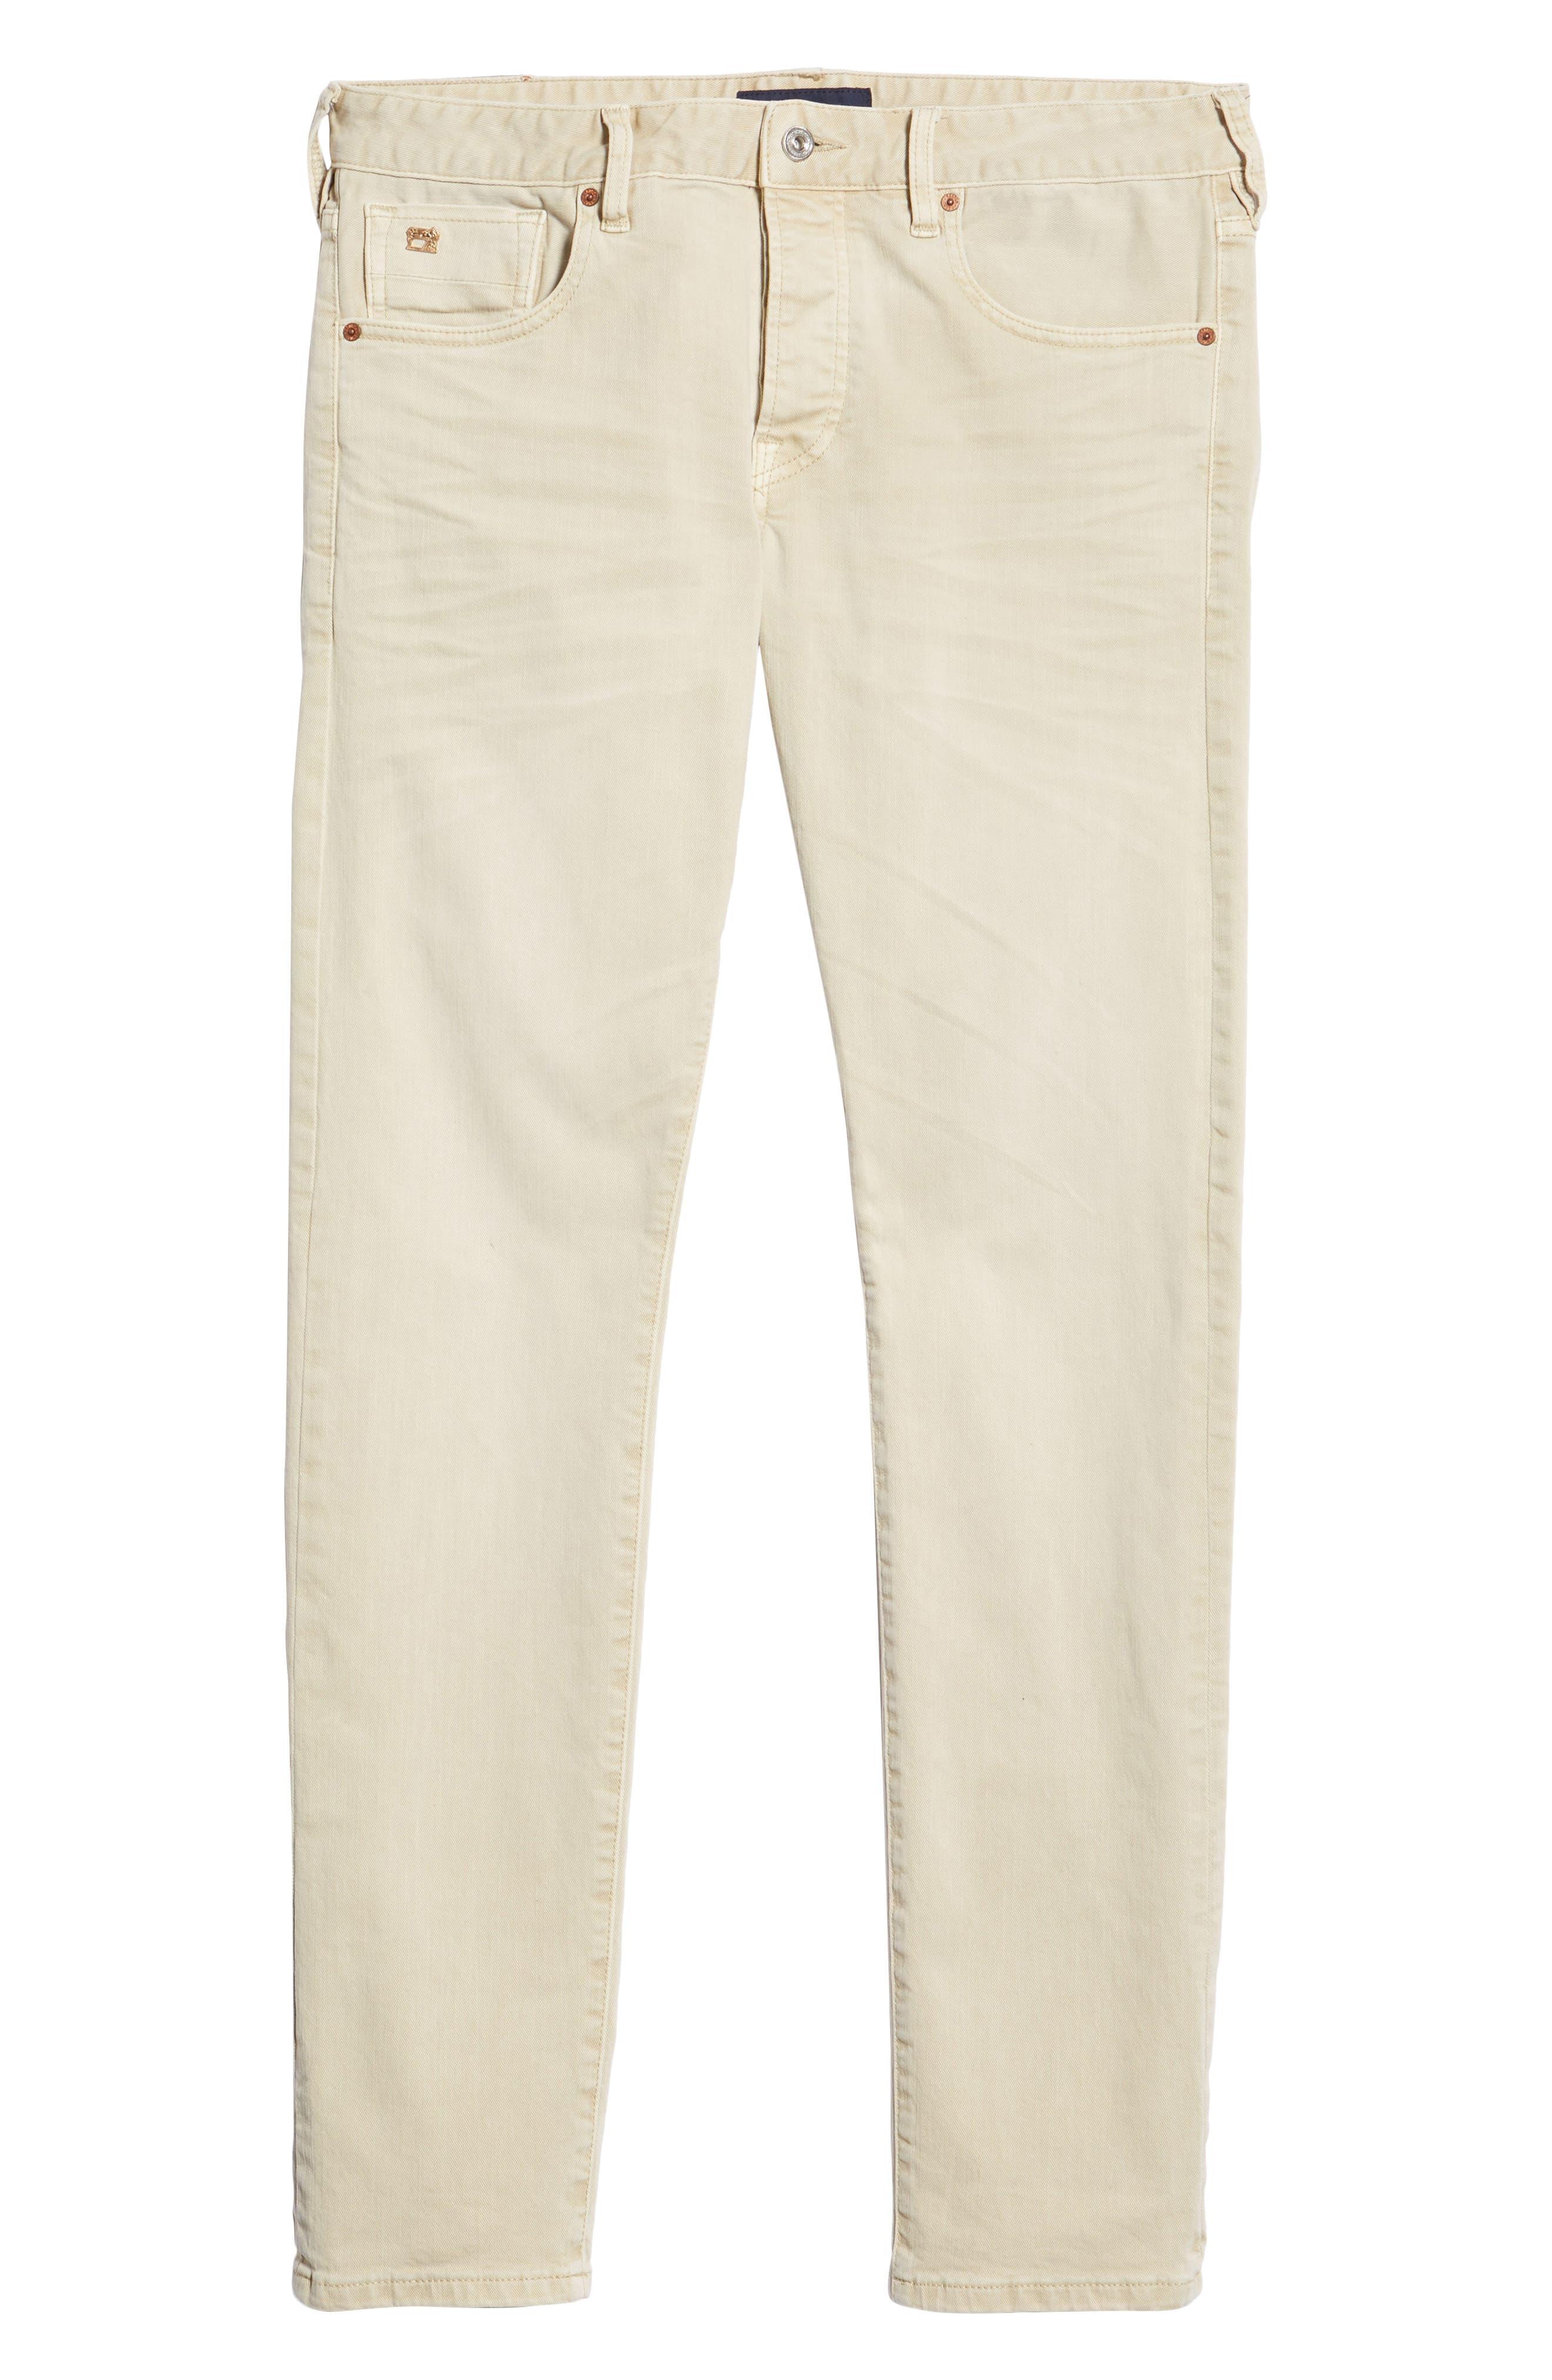 Ralston Slim Fit Pants,                             Alternate thumbnail 6, color,                             SAND